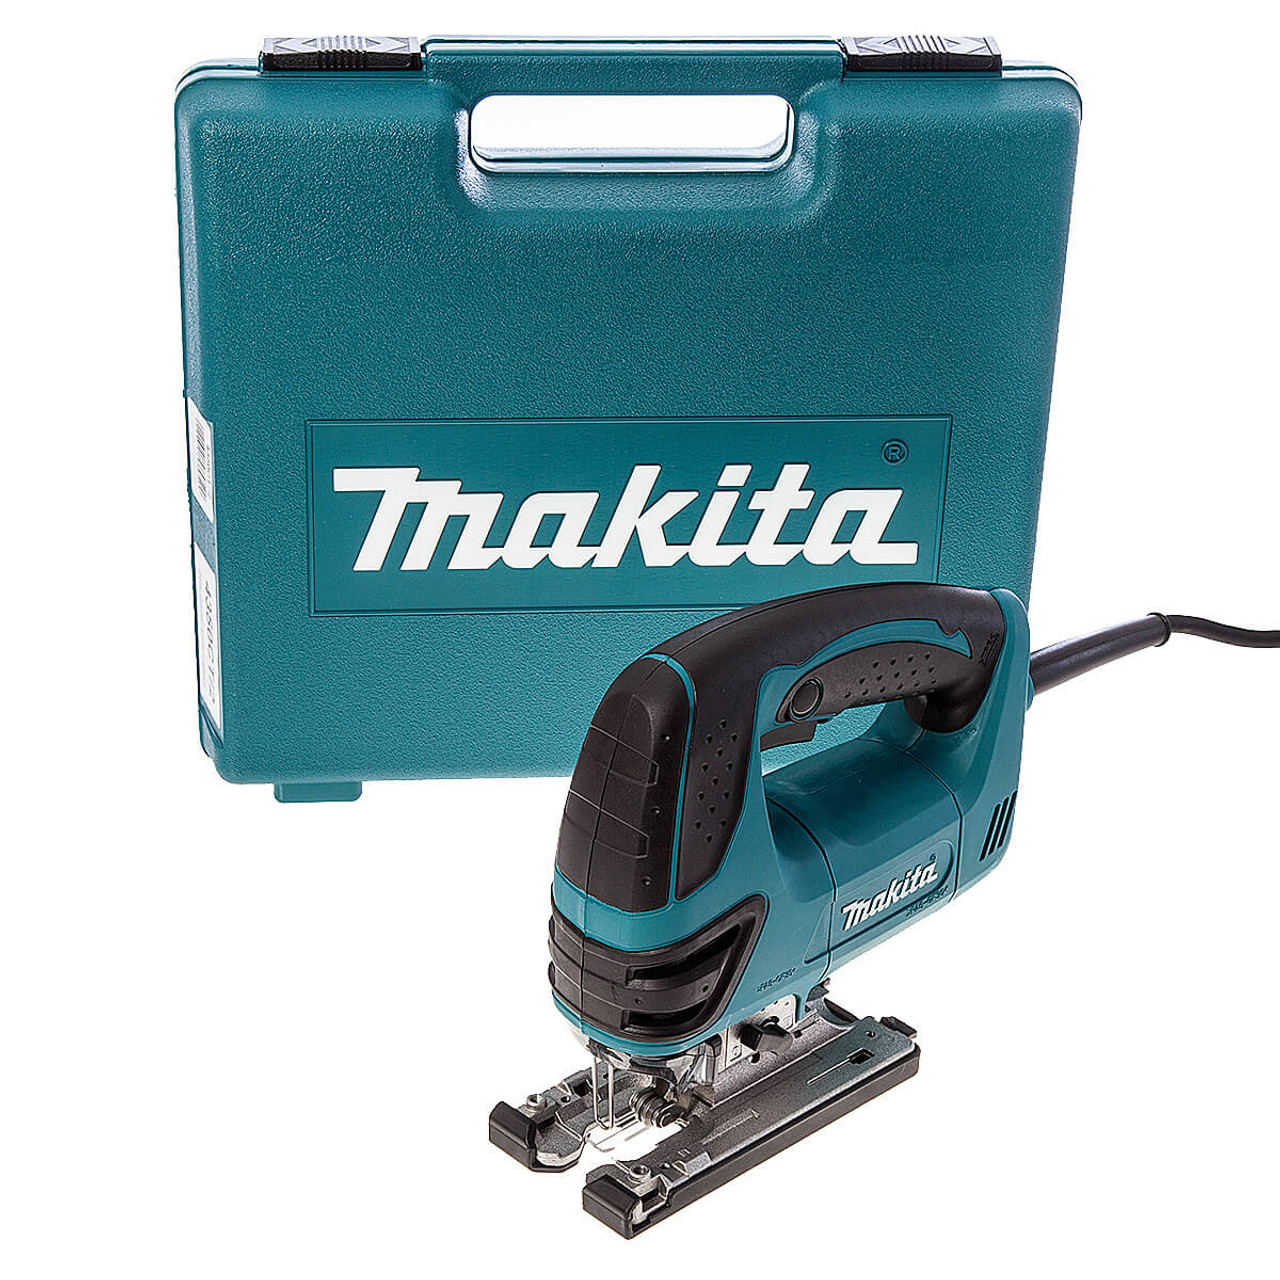 Makita 4350ct 240v Jigsaw Tool Less Blade Fixing Toolden